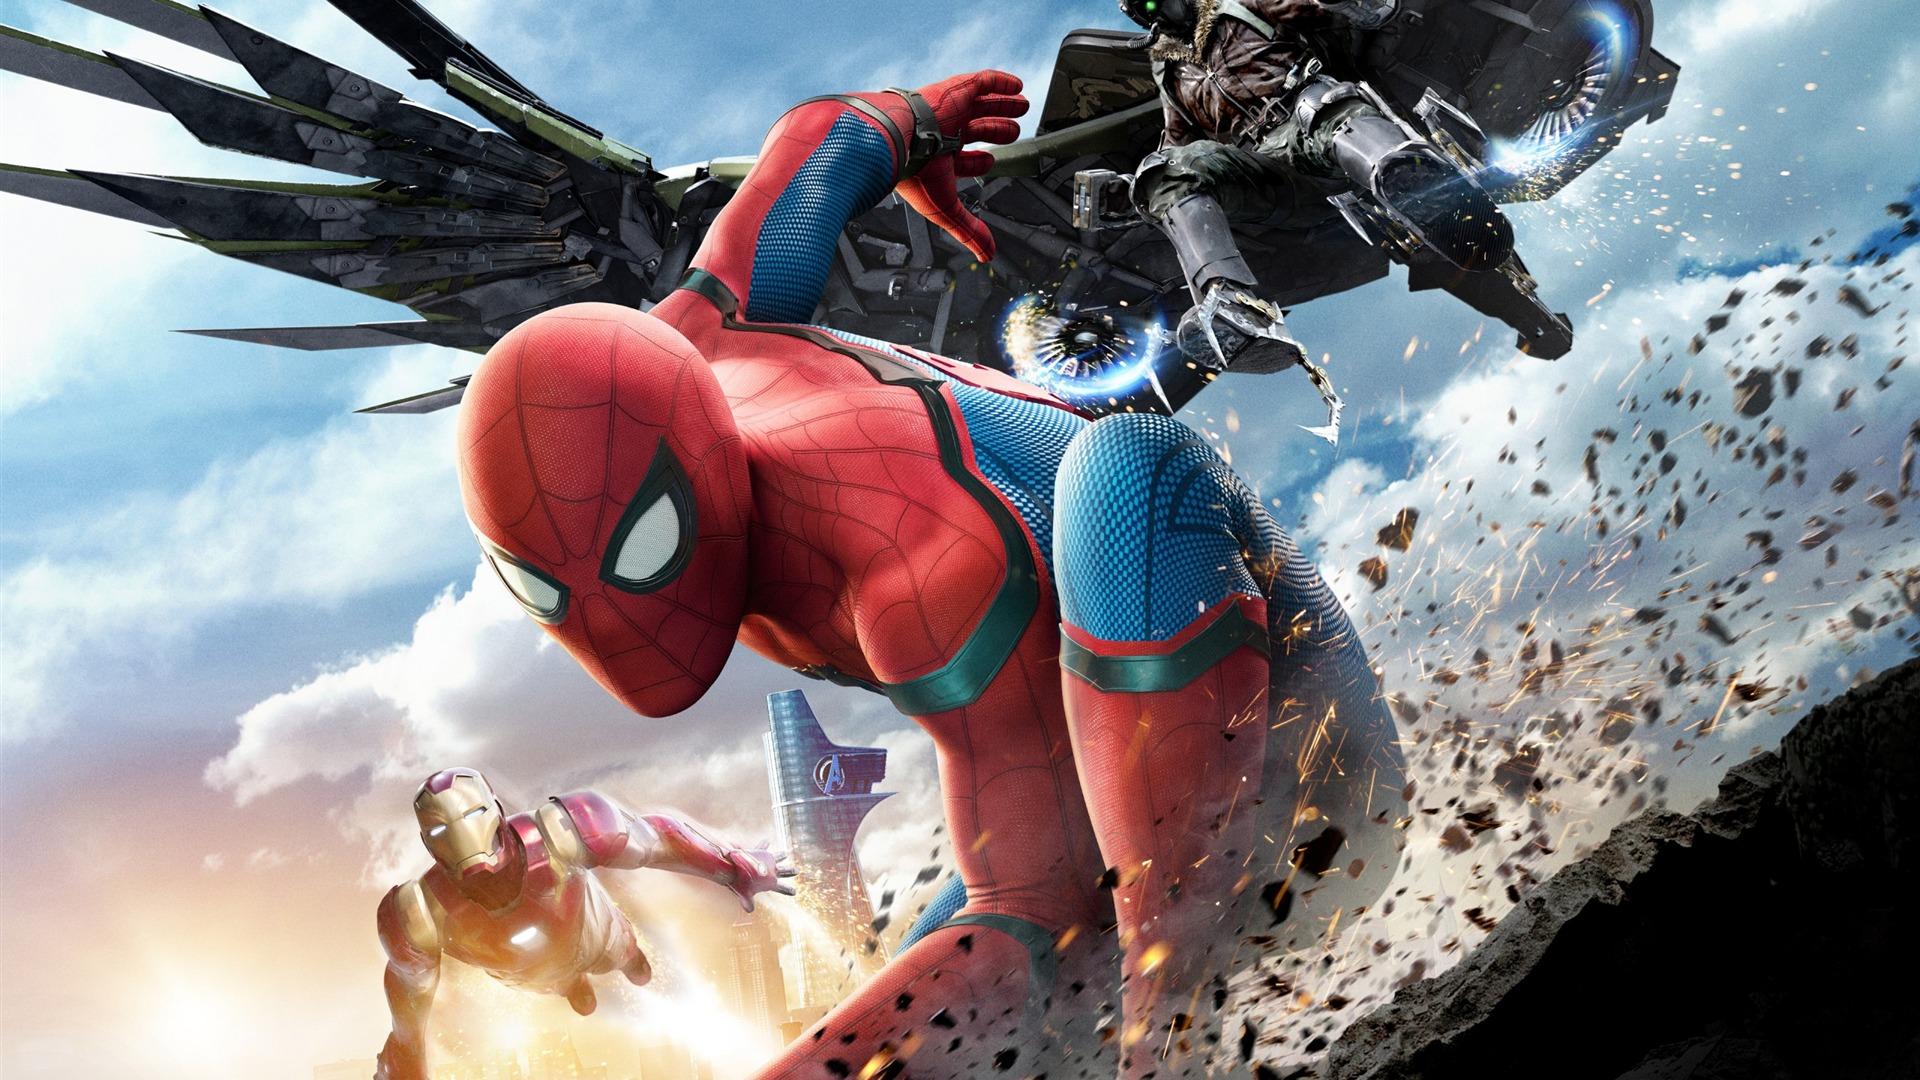 2017 Spider Man Homecoming Hd Movie Wallpaper 06 Avance